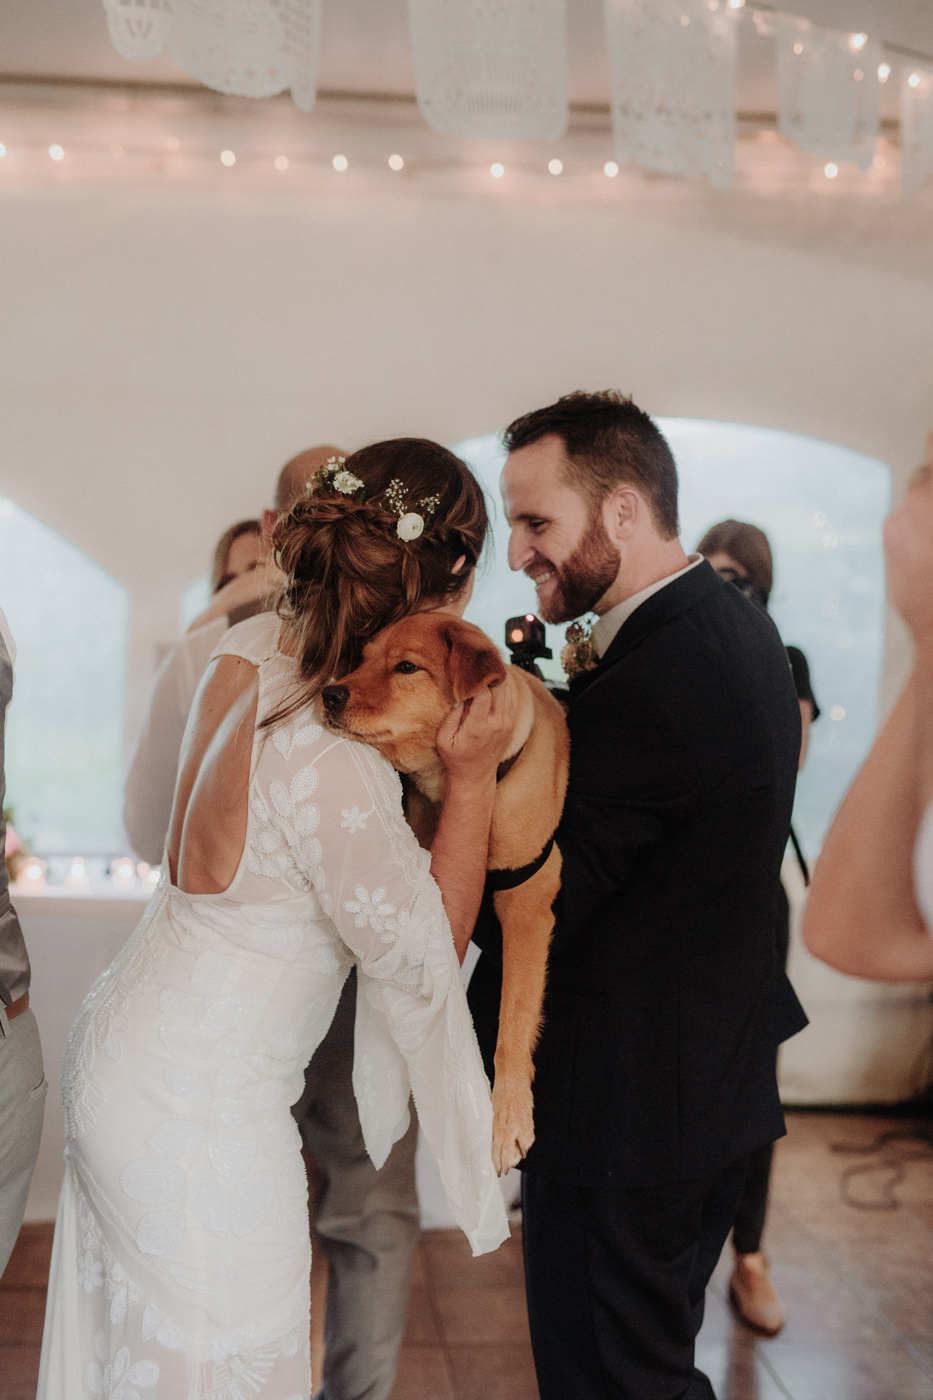 woods-walk-trail-crested-butte-colorado-wedding-137.jpg